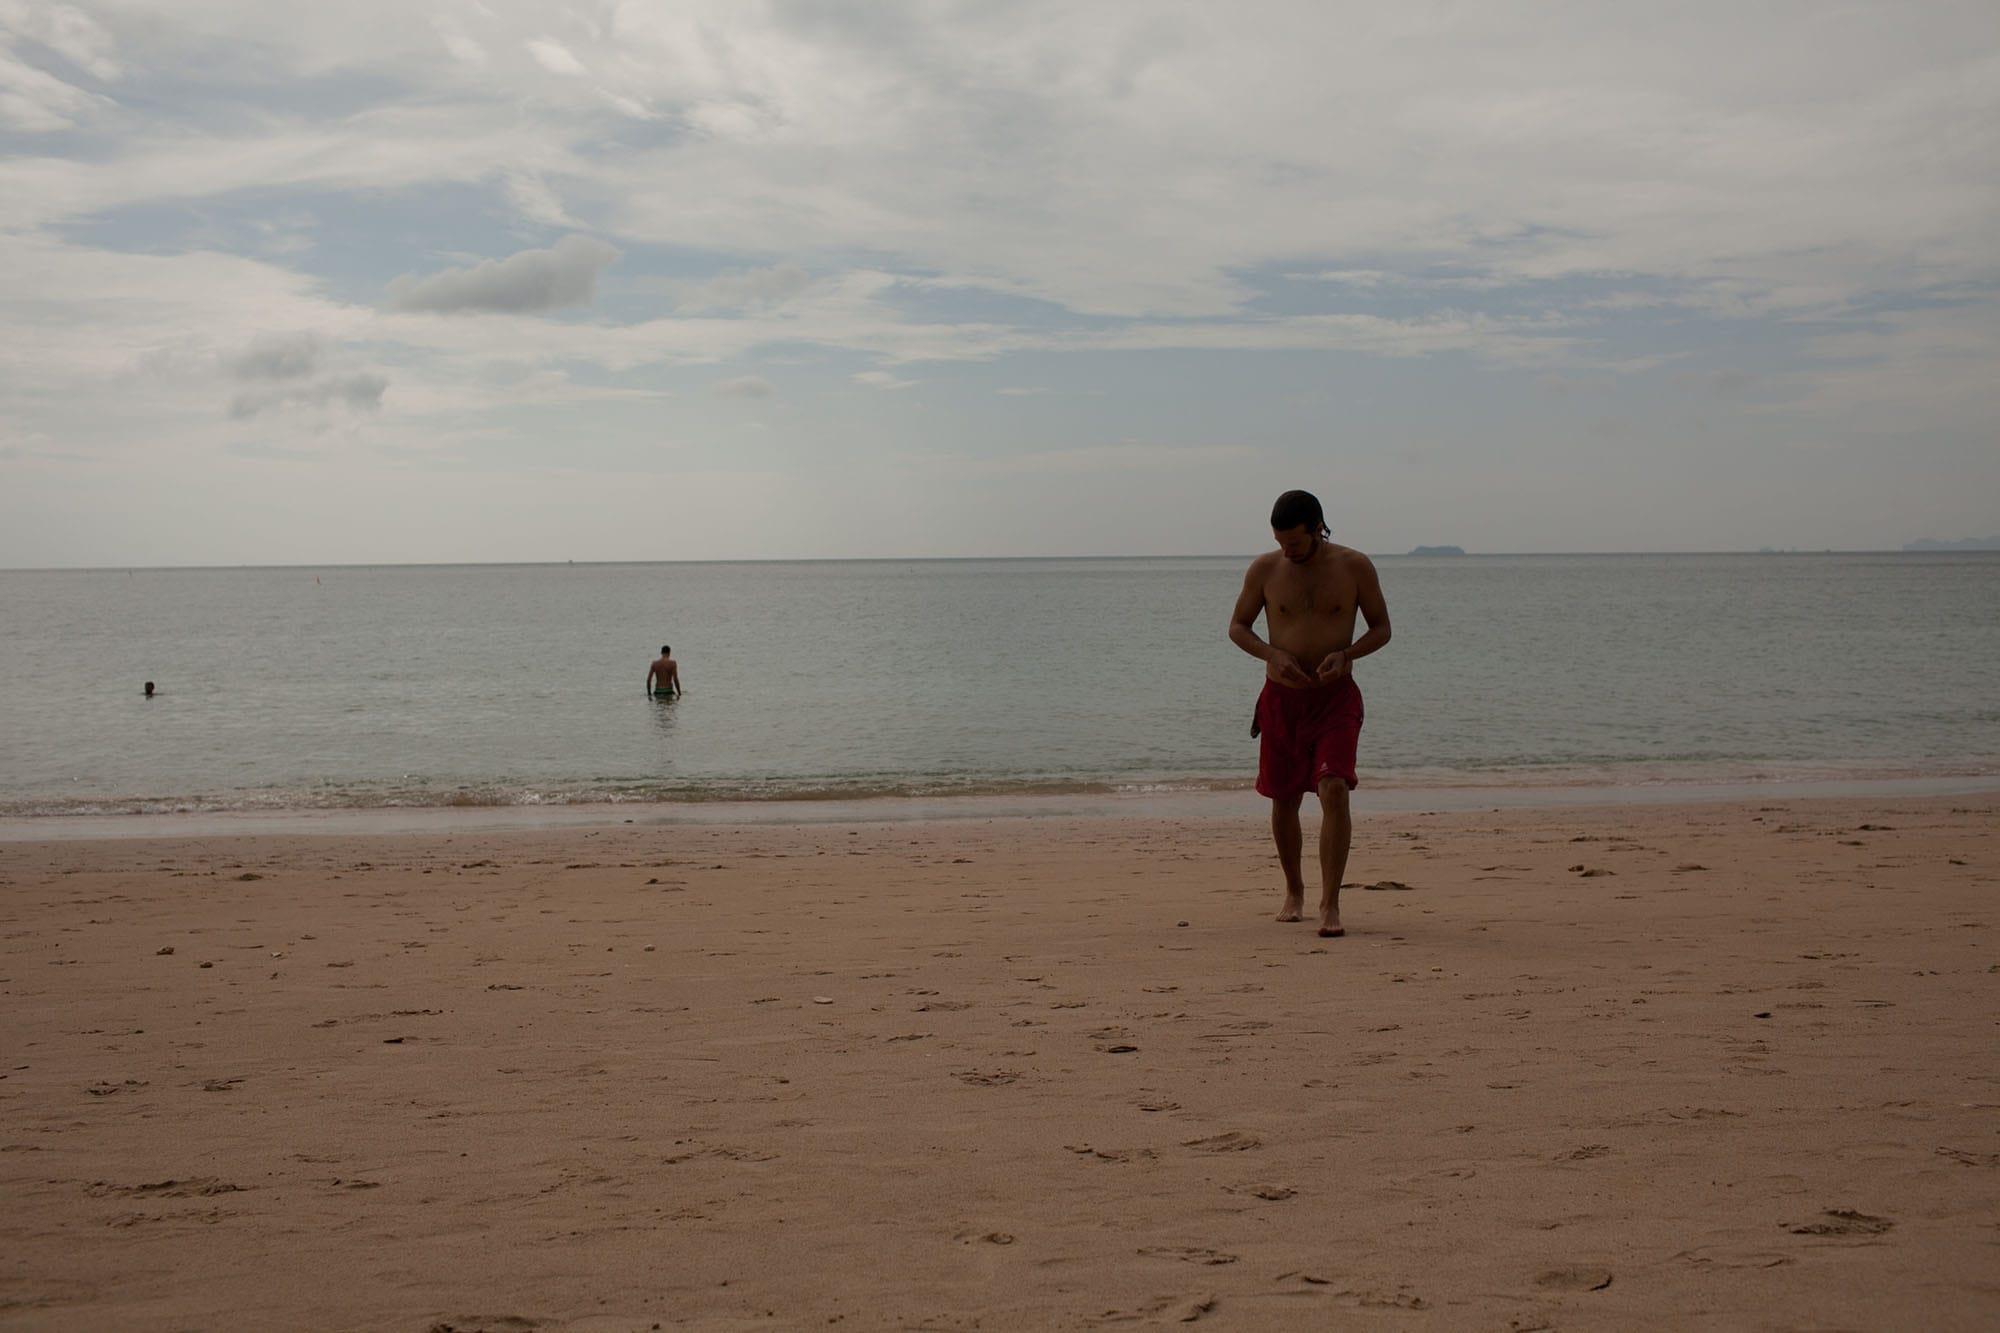 Returning from a swim in Koh Lanta, Thailand